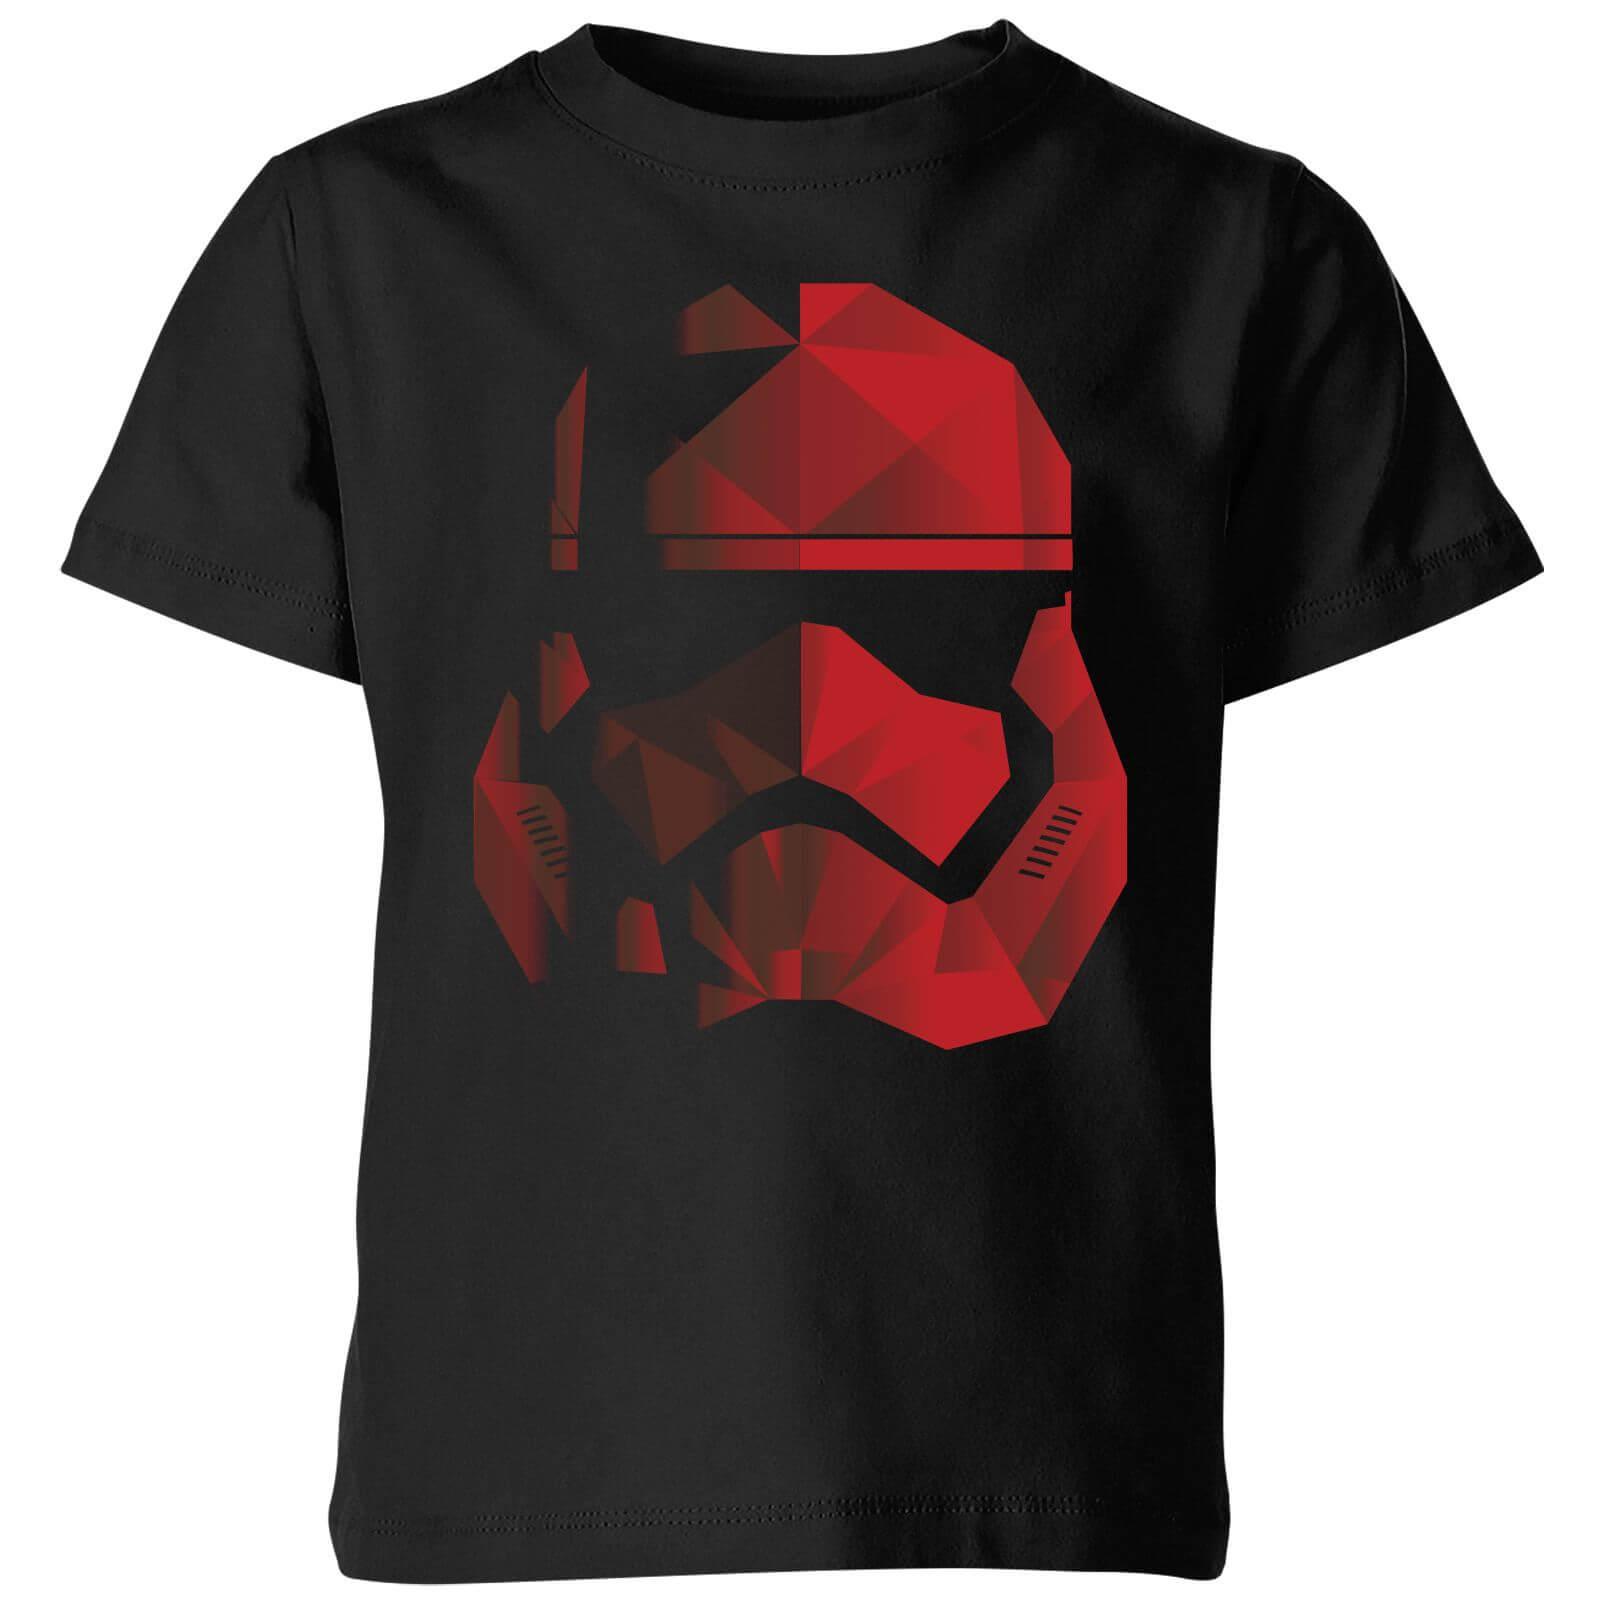 Star Wars T-Shirt Enfant Casque Stormtrooper Effet Cubiste - Star Wars - Noir - 11-12 ans - Noir